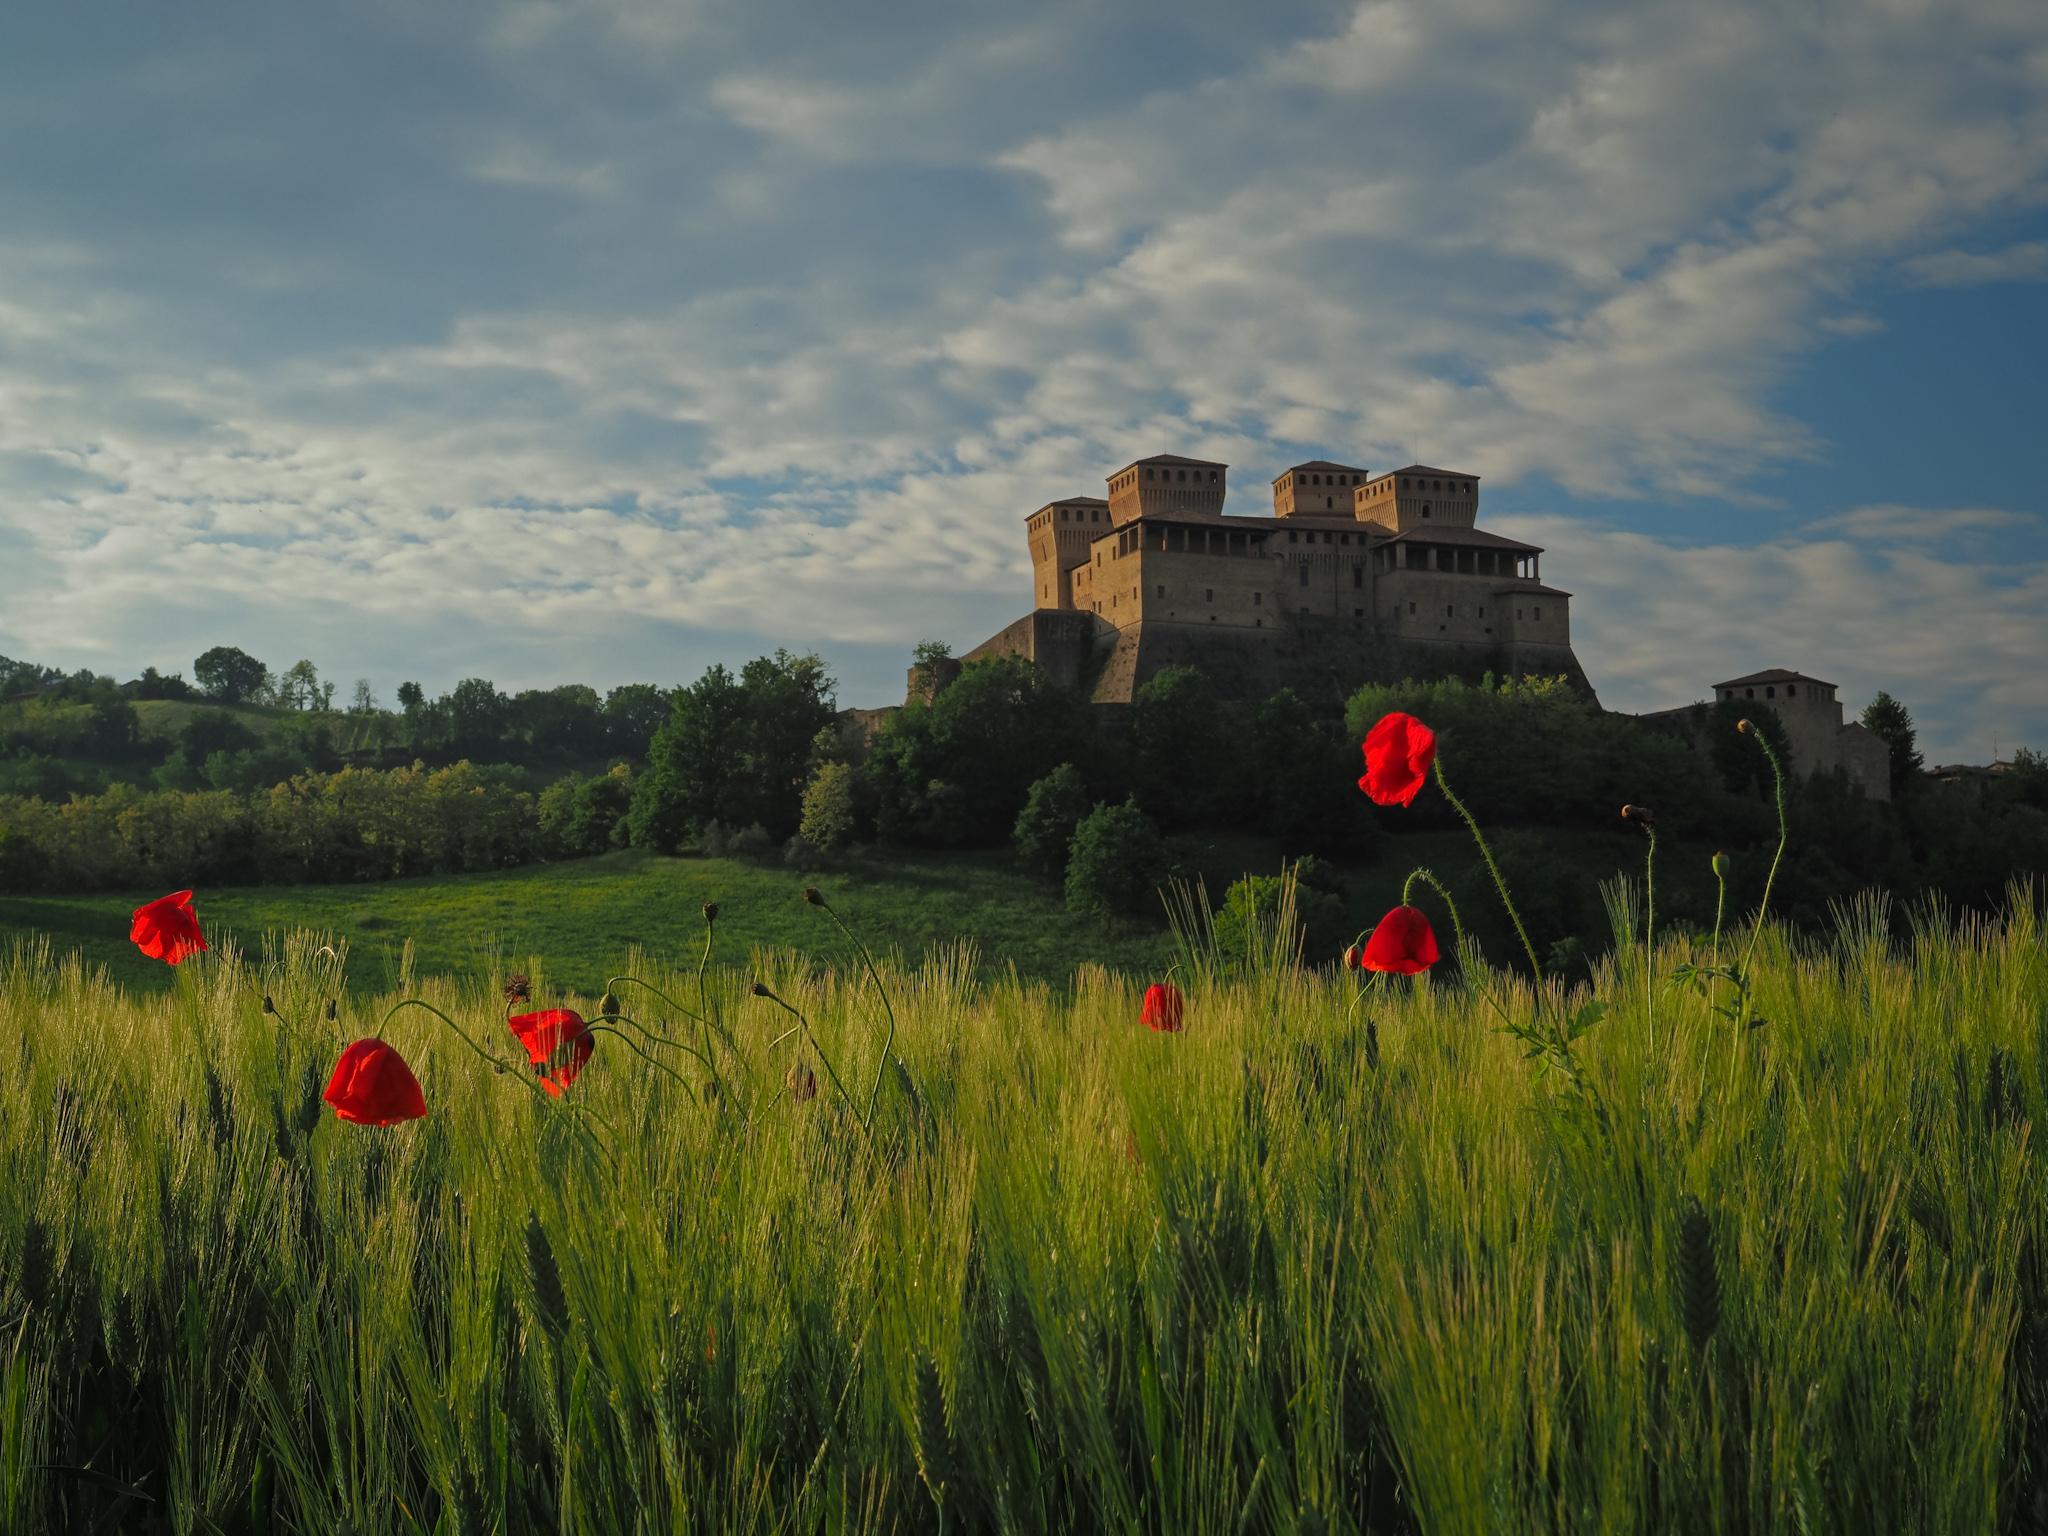 Postcard from Torrechiara ...